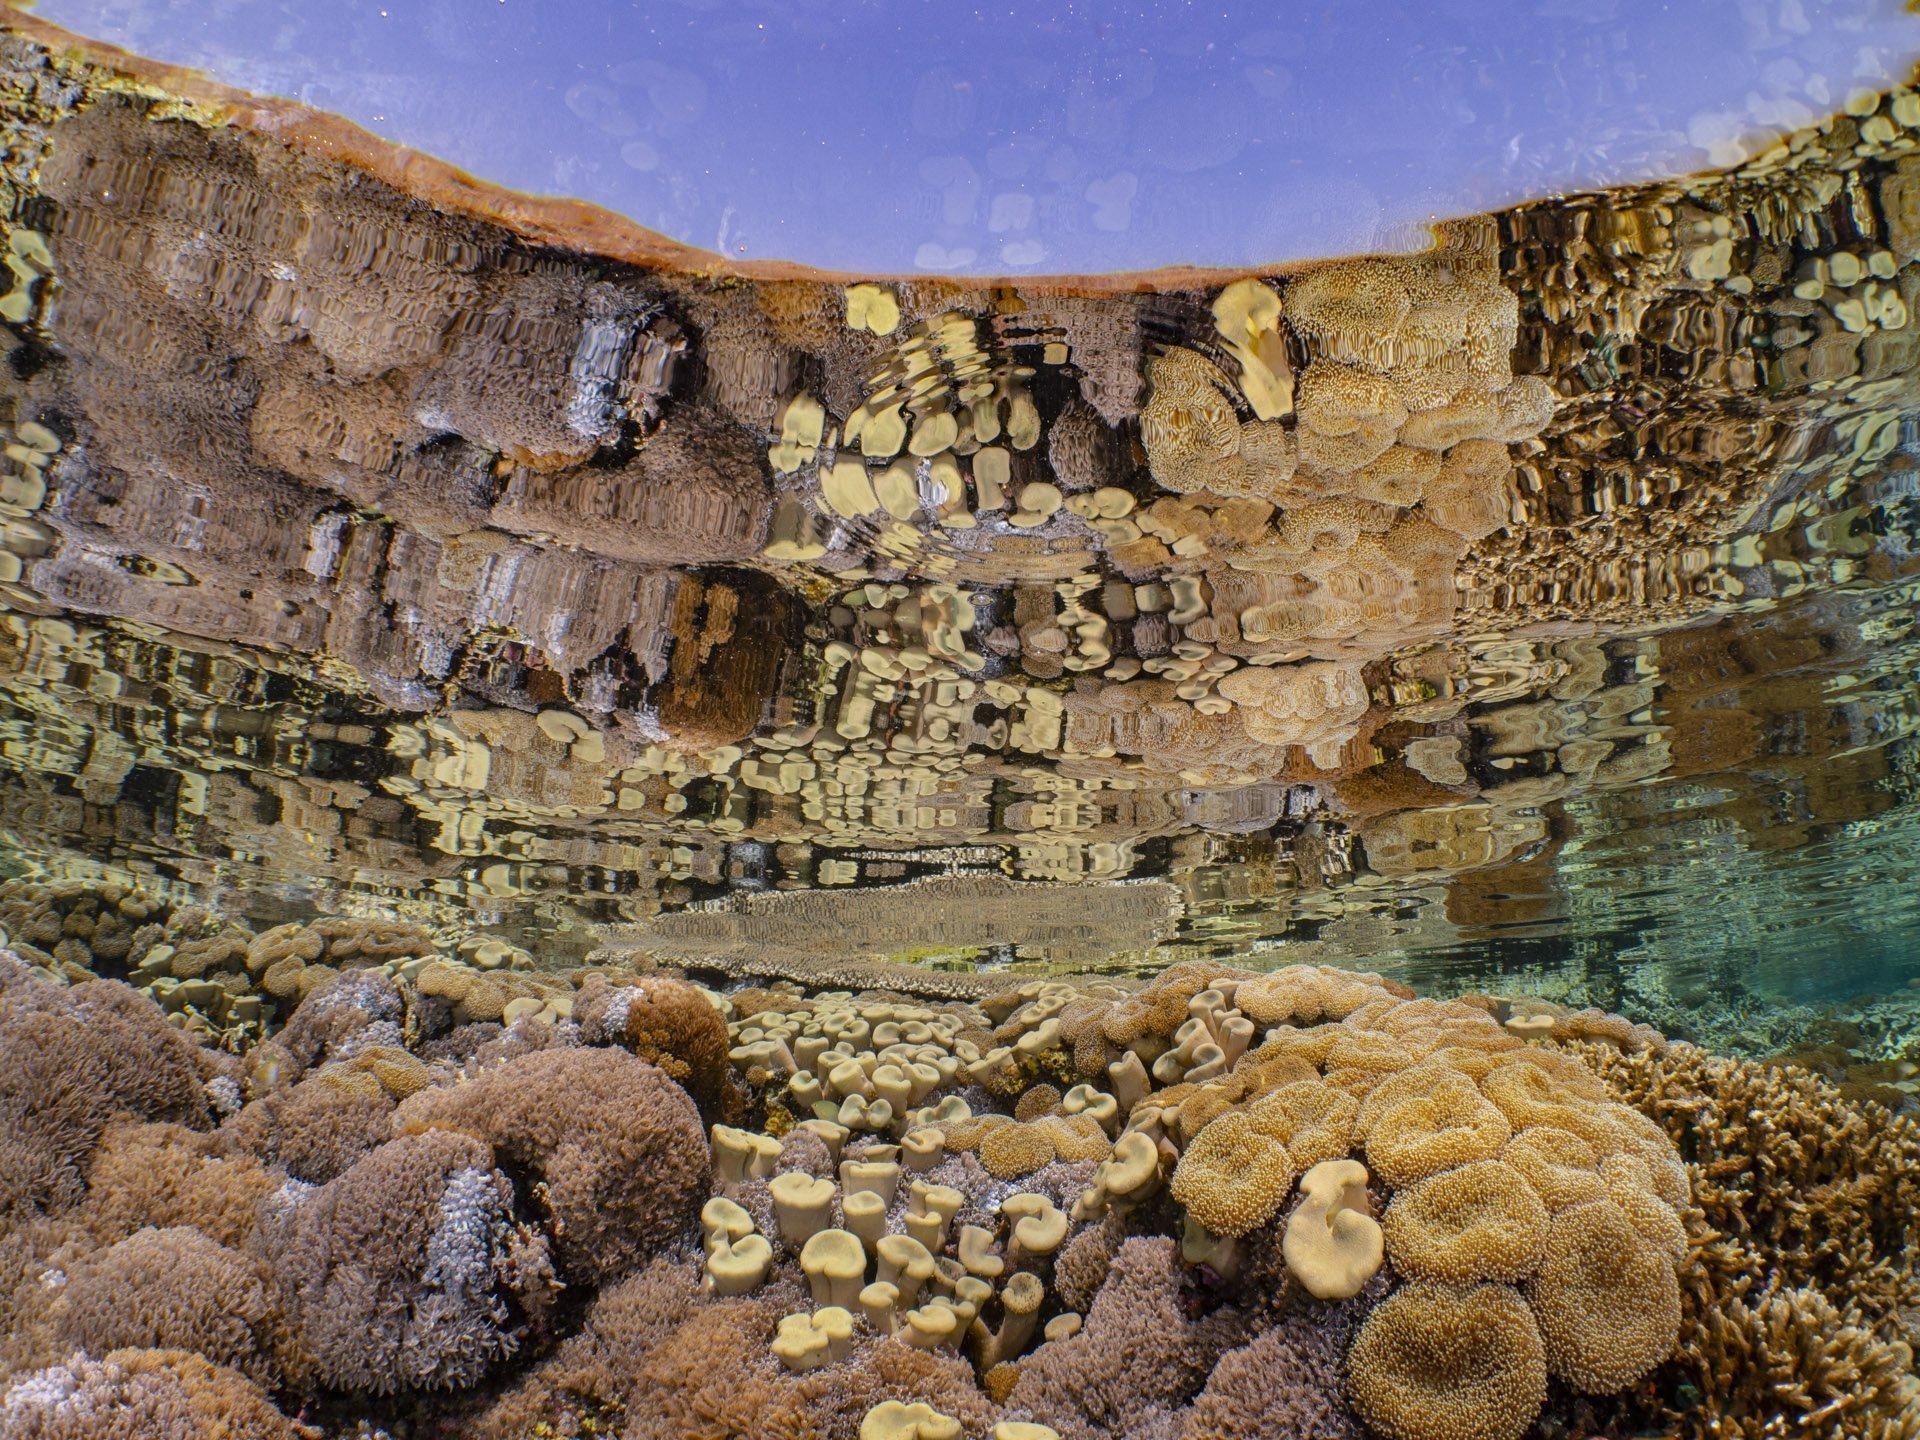 Reef reflection in Komodo National Park